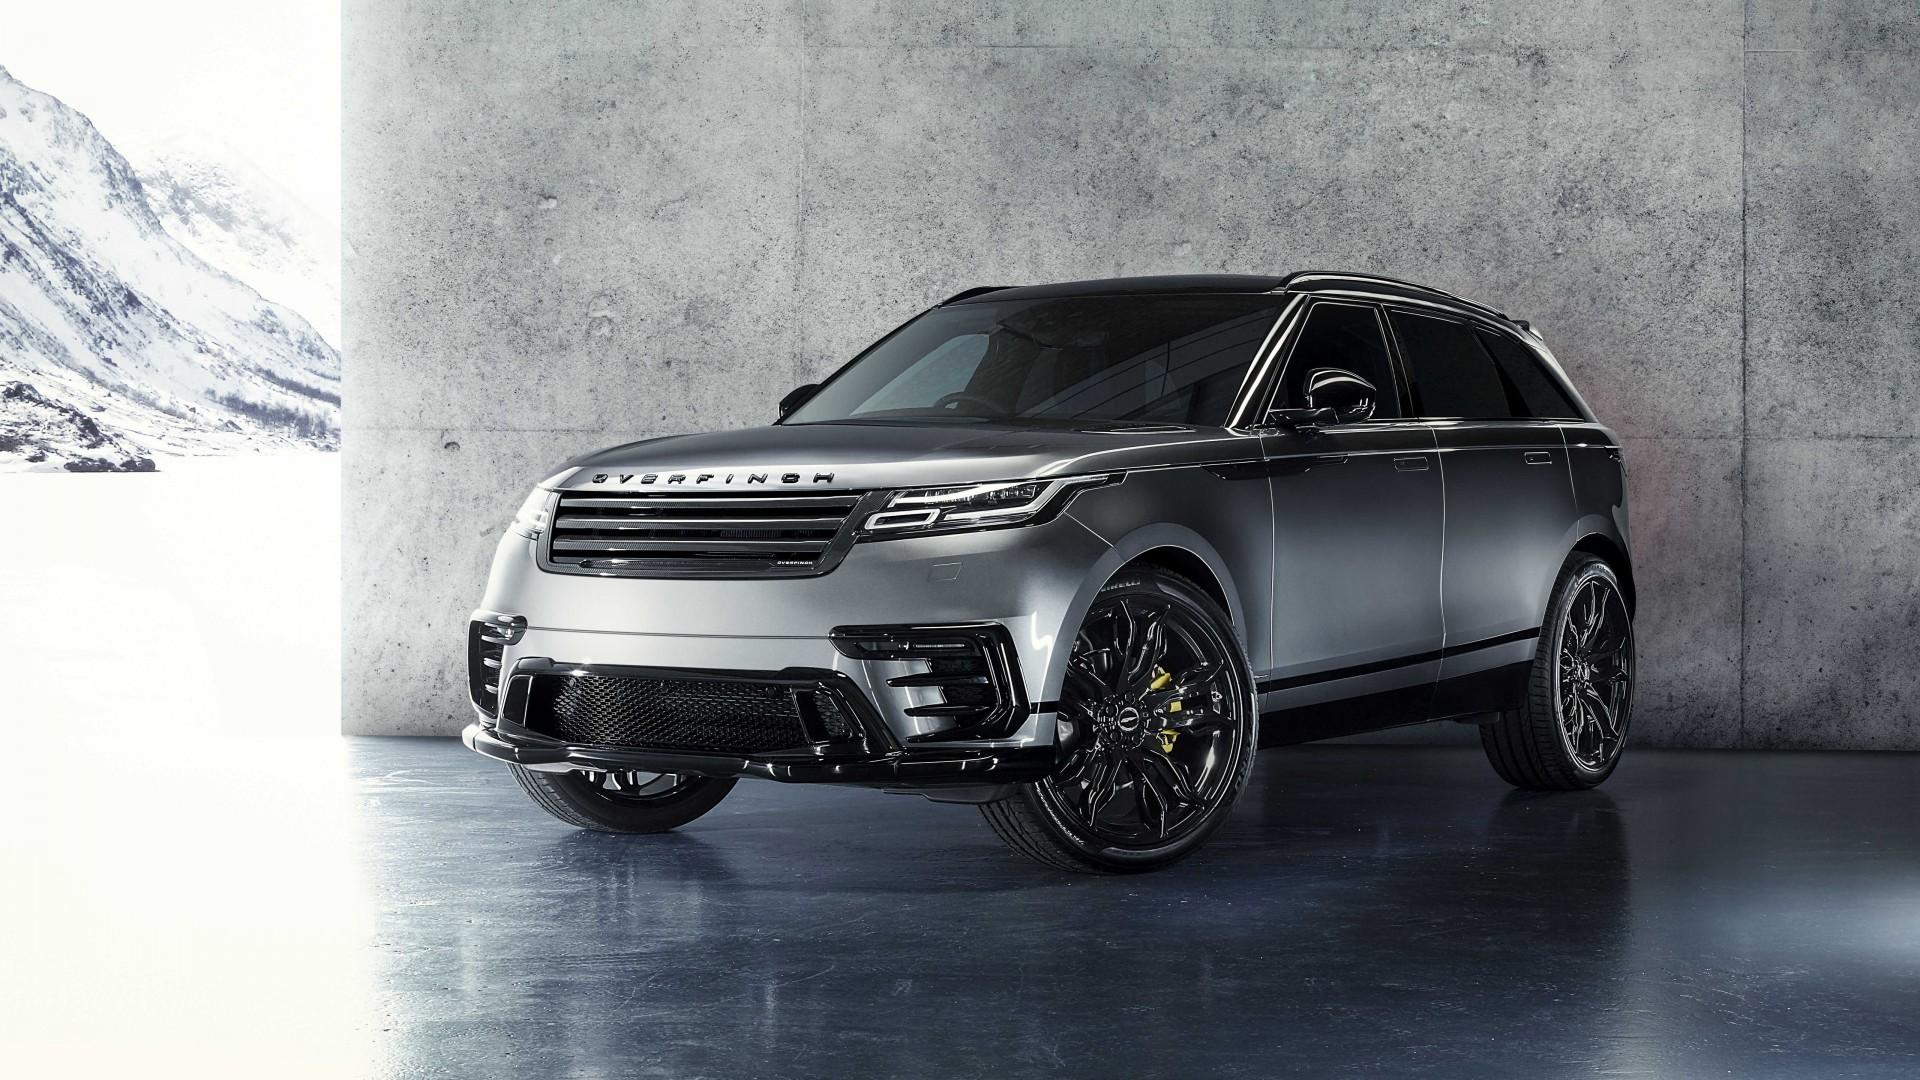 Land Rover Range Rover >> Overfinch Range Rover Velar 2019 5K 2 Wallpaper | HD Car Wallpapers | ID #12048